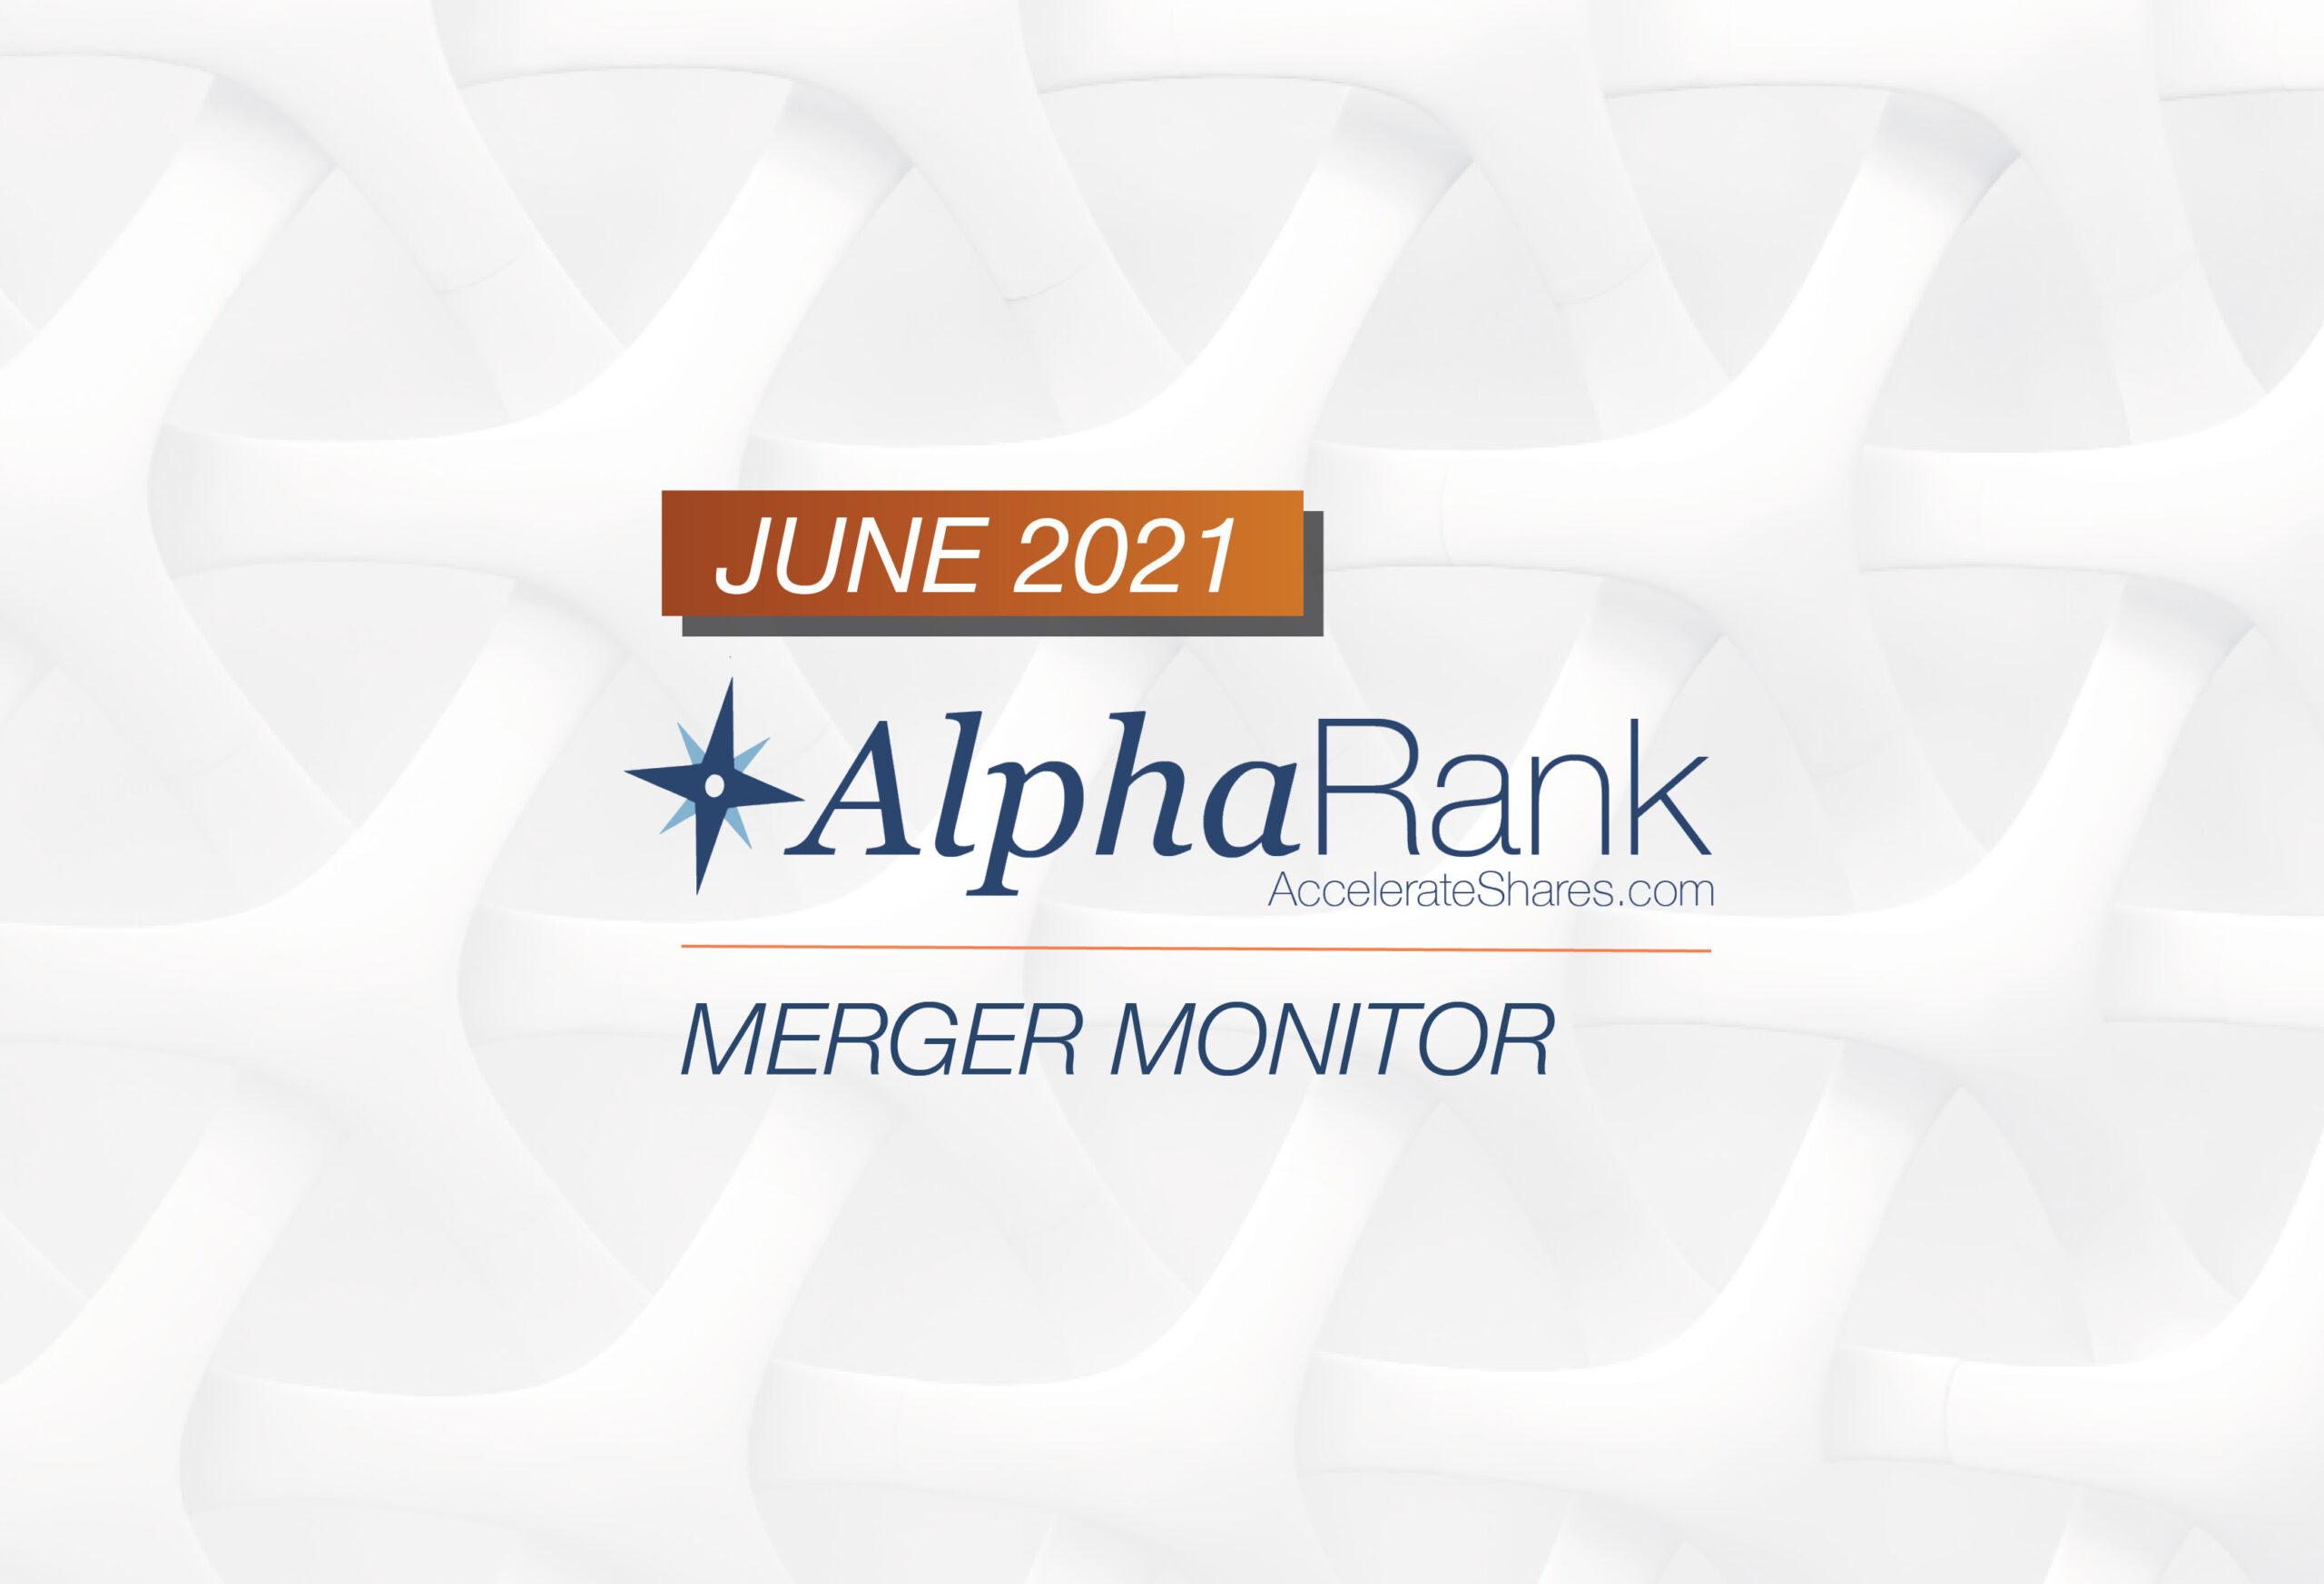 AlphaRank Merger Monitor – June 2021